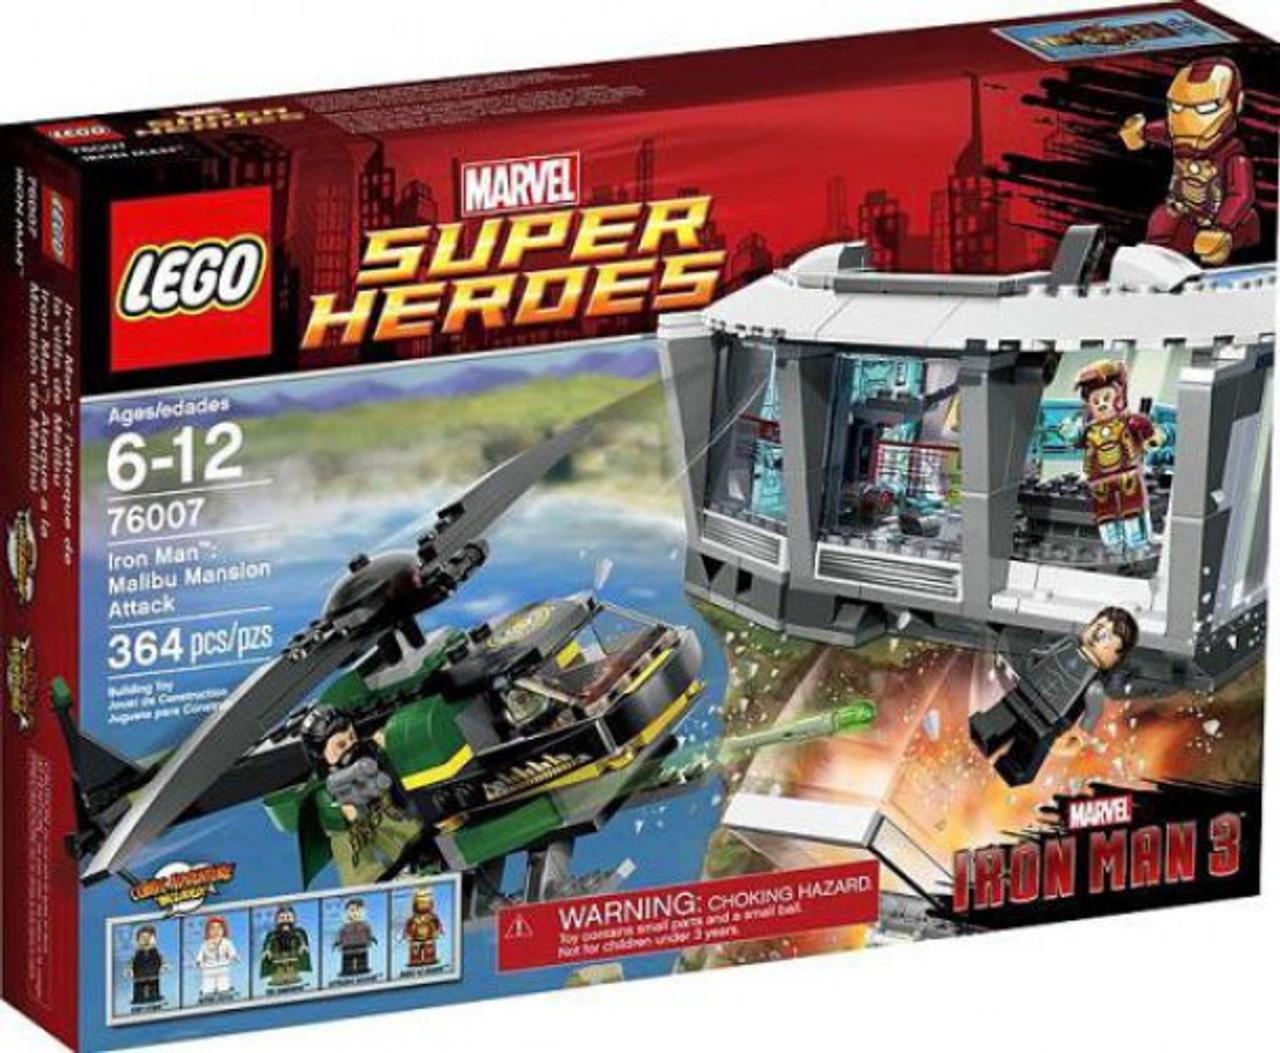 Extremis Soldier Iron Man 76007 LEGO Minifigure